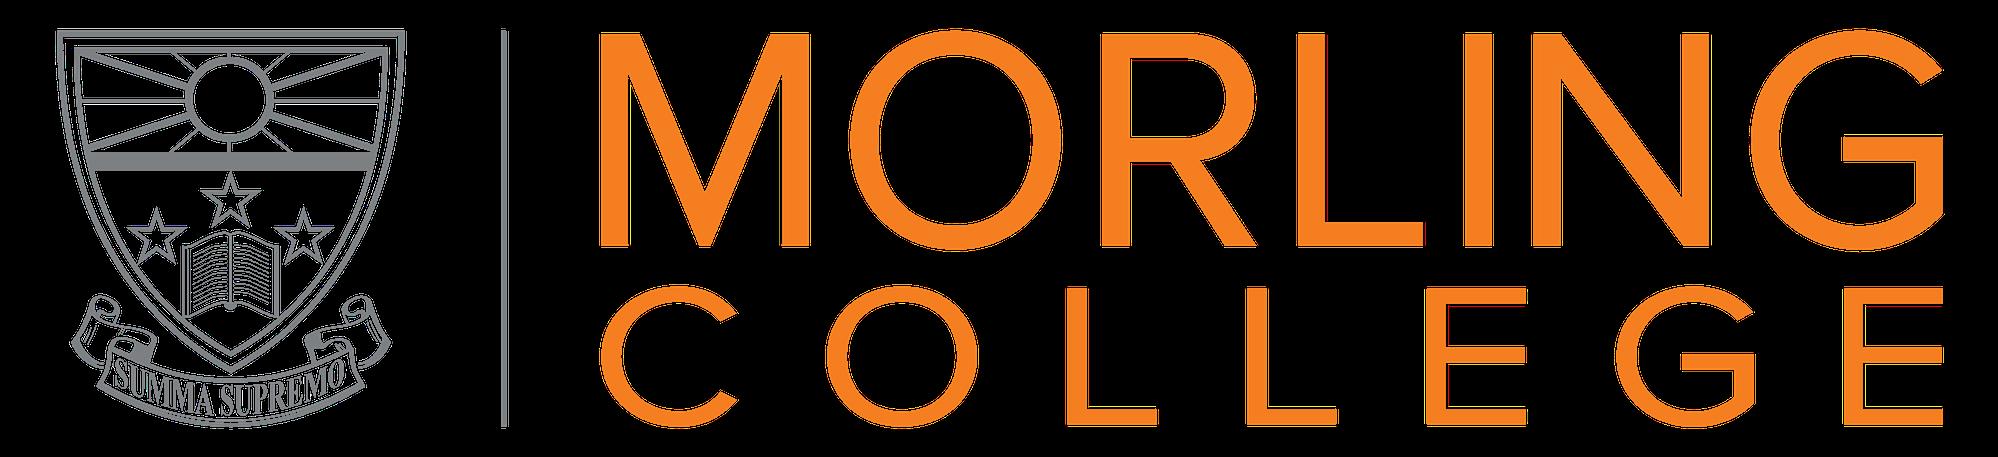 basecamp 2020 partnership logos morling college logo